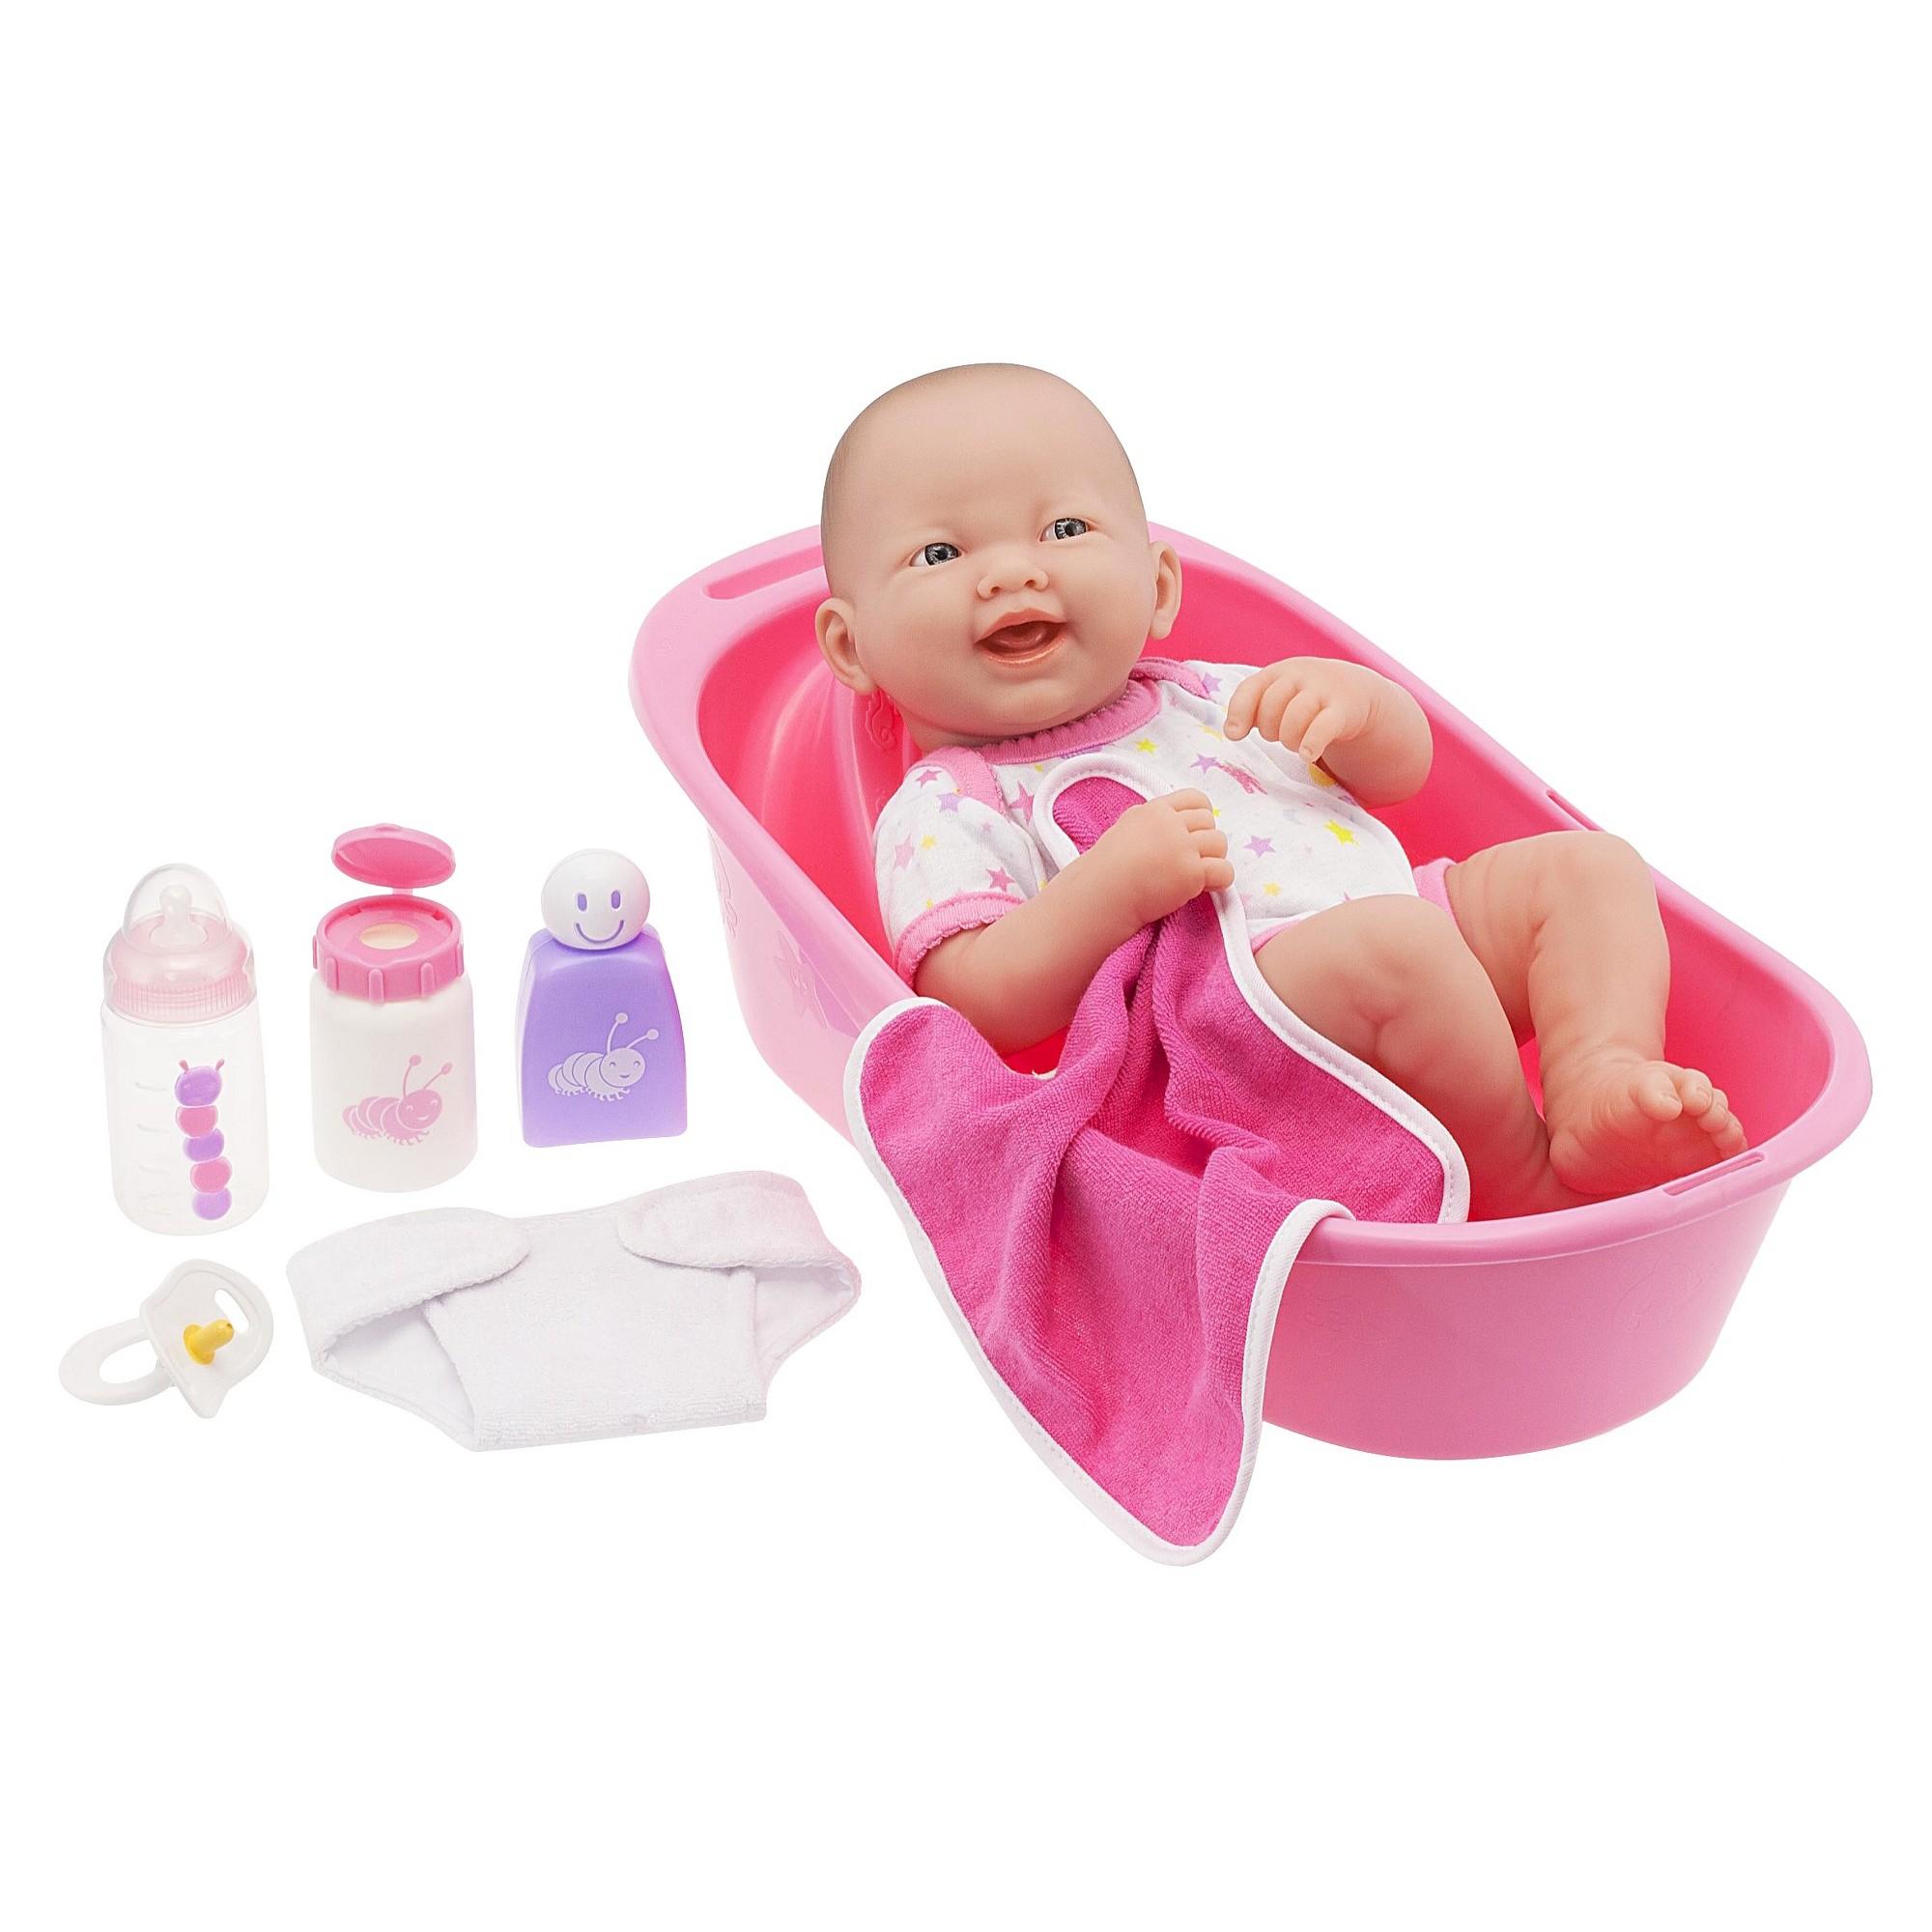 JC Toys La Newborn 14 Deluxe Bath Washable All Vinyl Baby Doll Bath ...